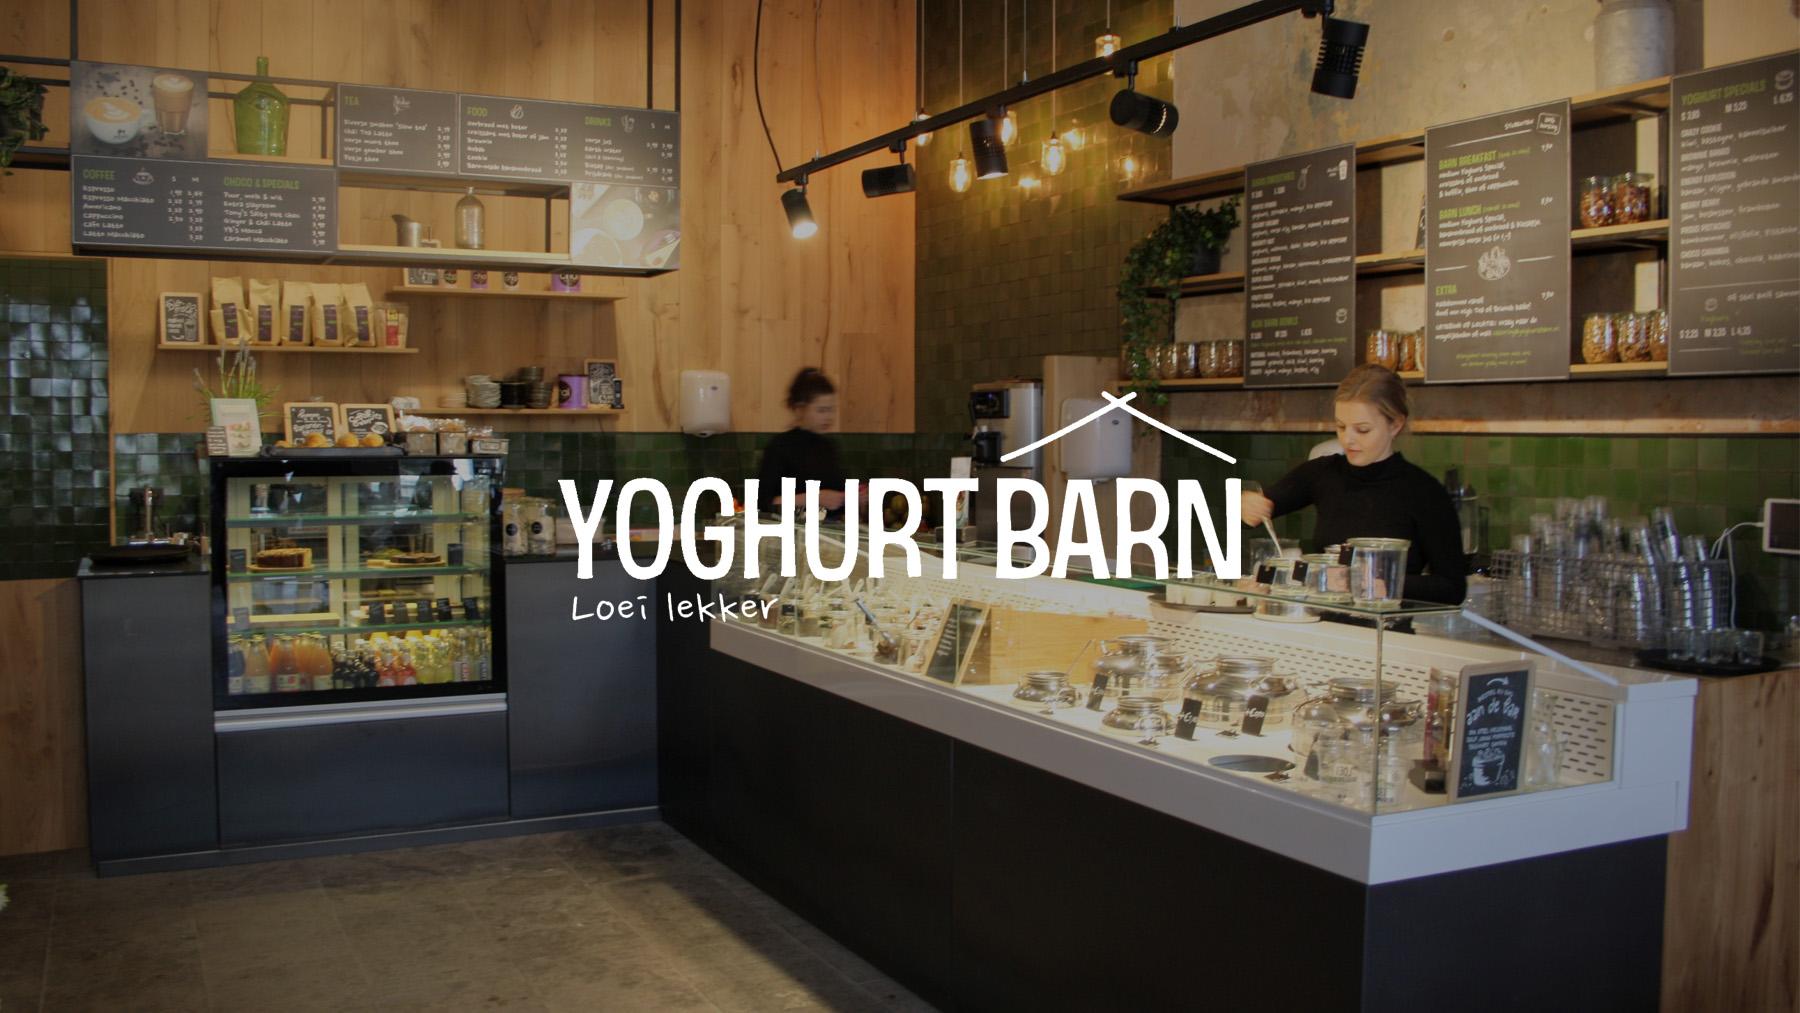 achtergrond muziek yoghurt barn banner